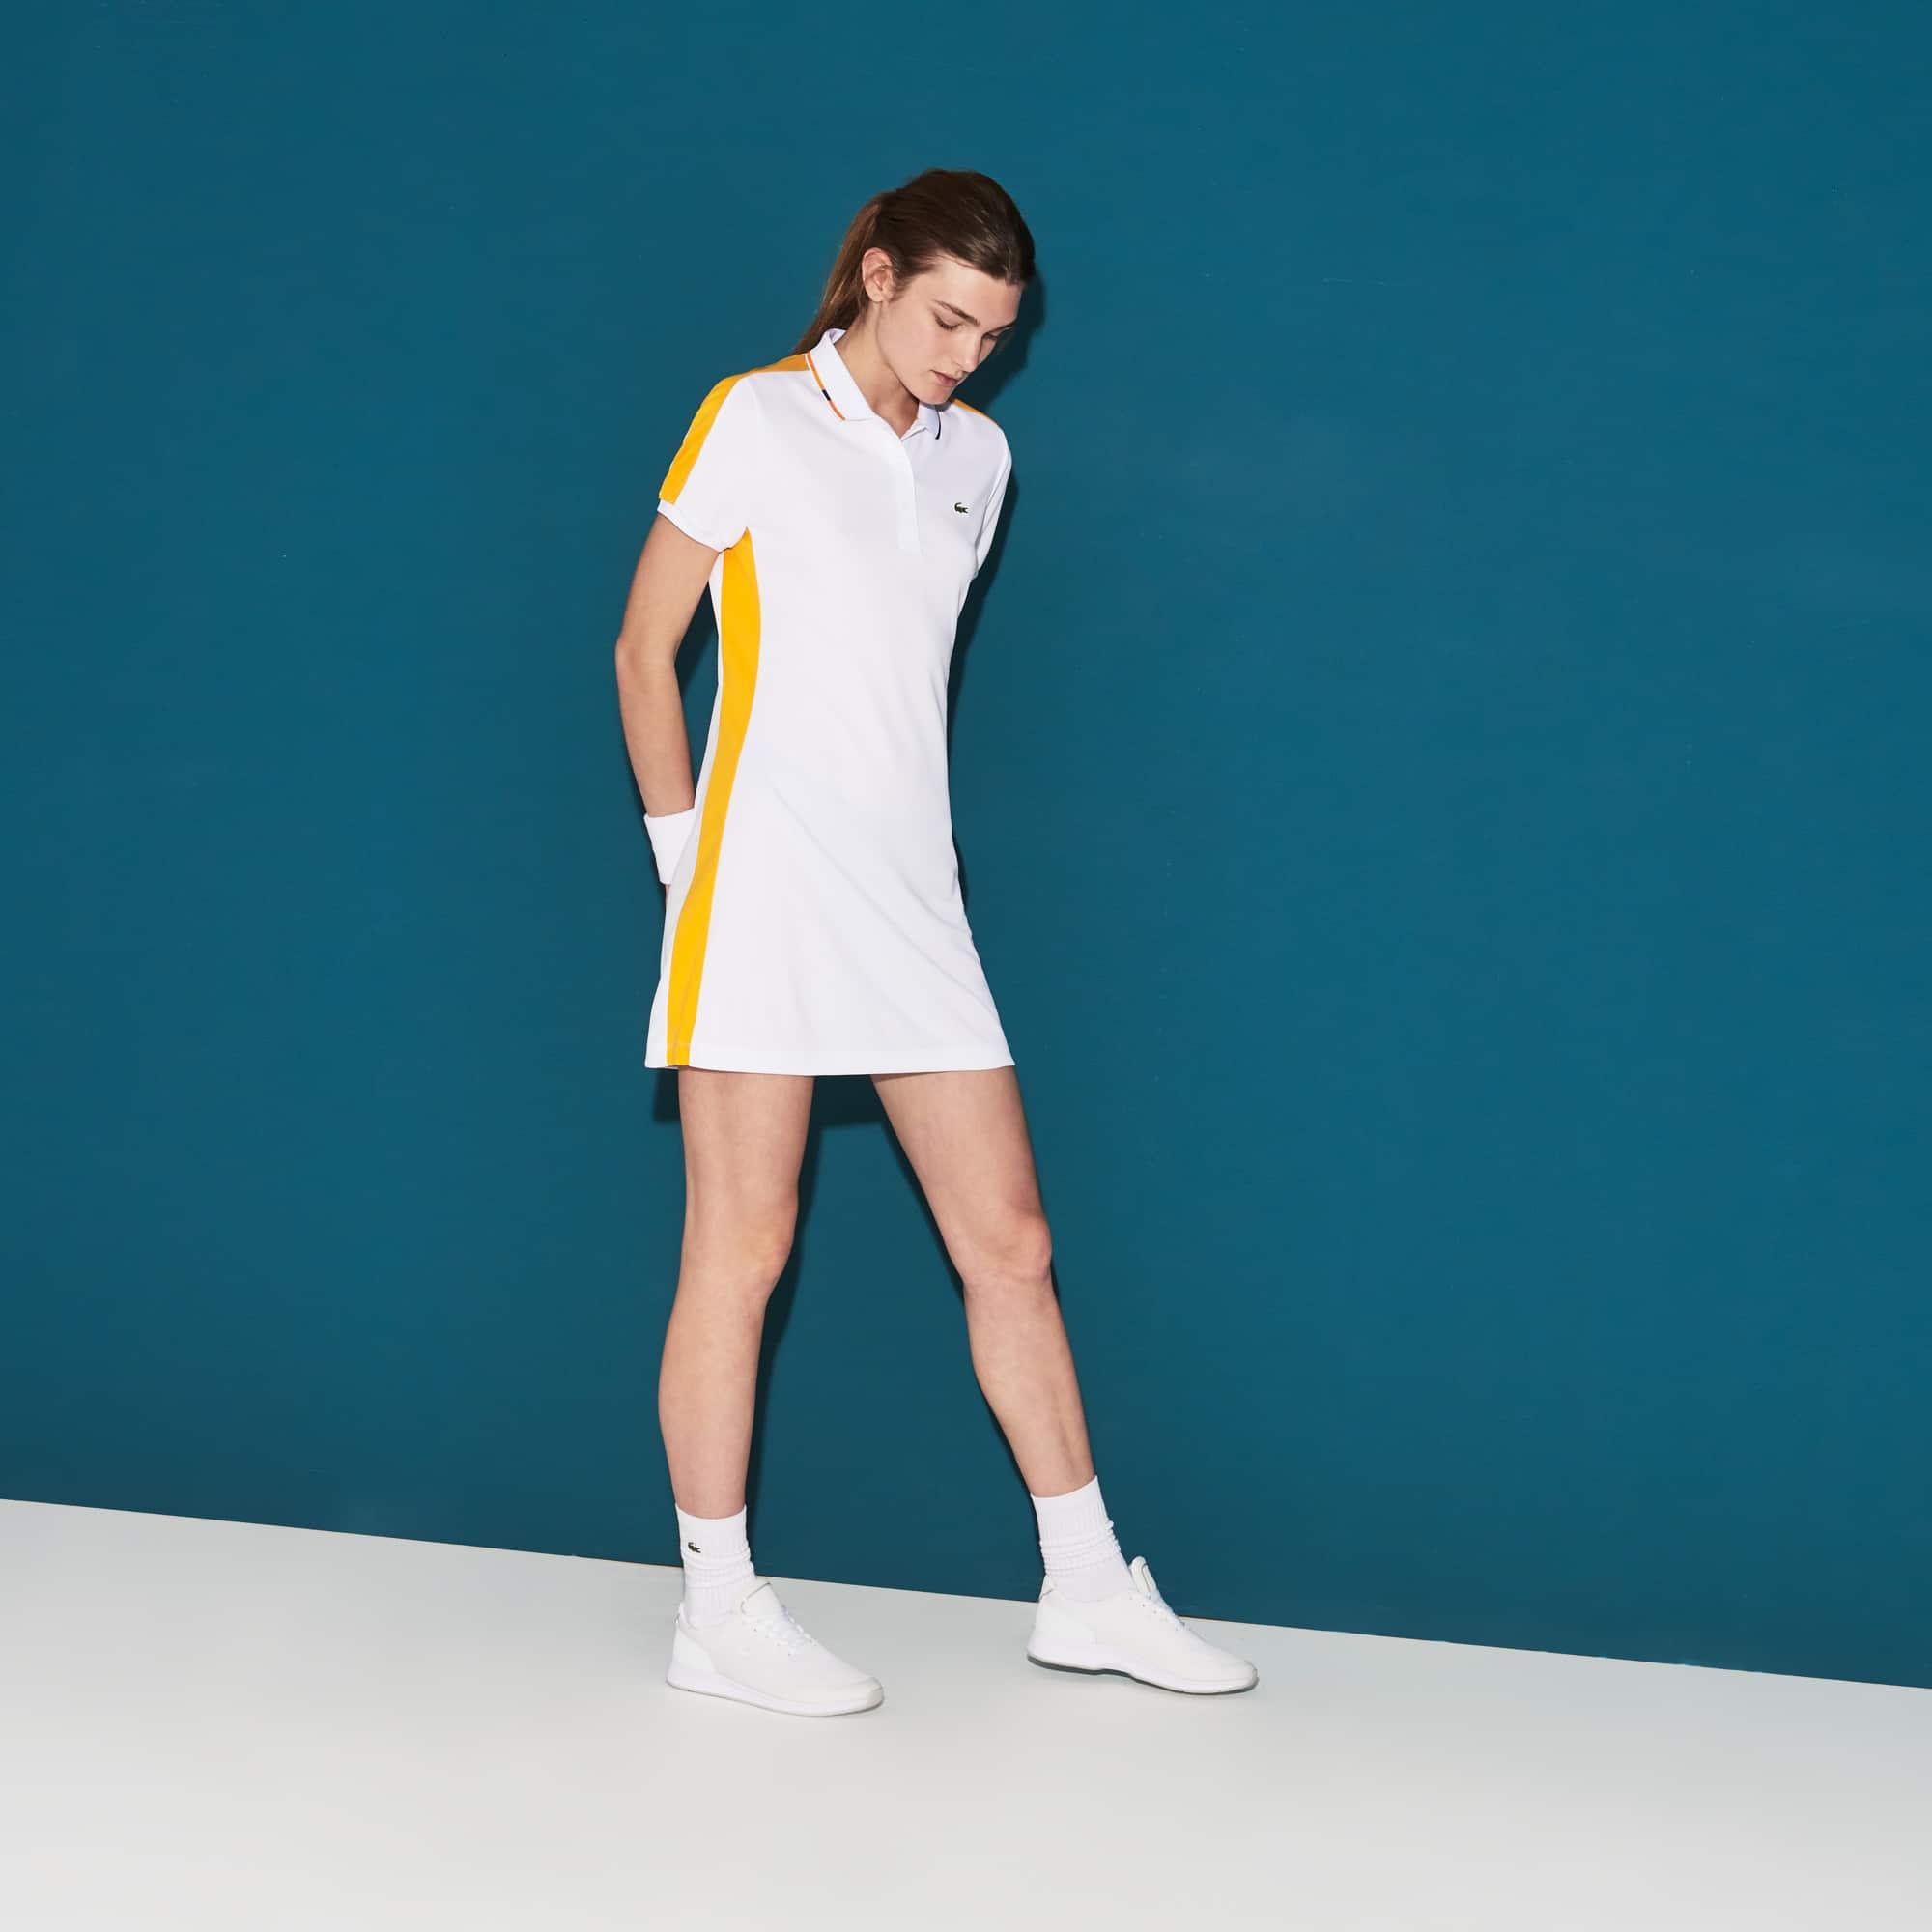 Abito a polo Tennis Lacoste SPORT in piqué tecnico con fasce a contrasto